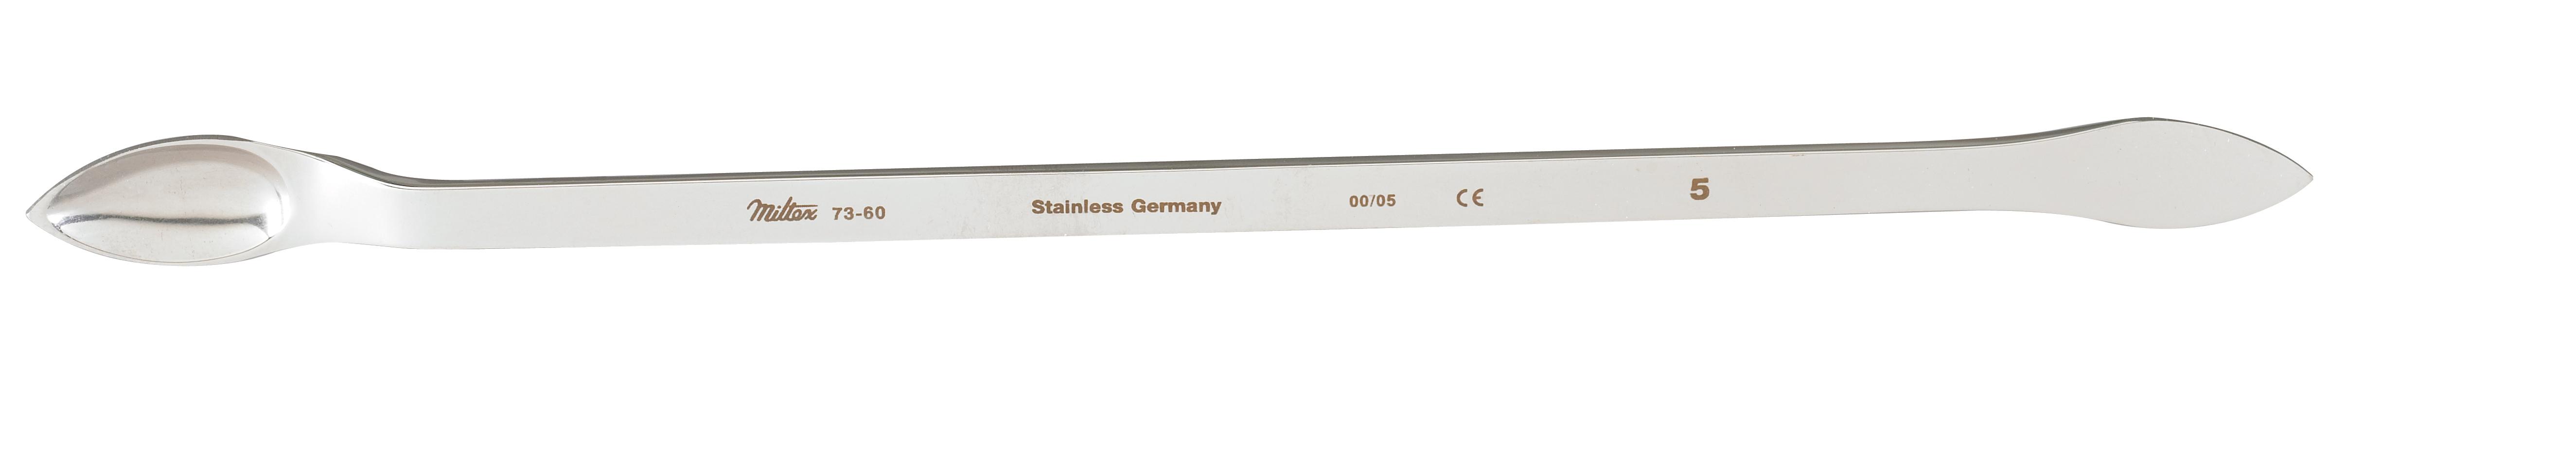 no-5-wax-spatula-73-60-miltex.jpg